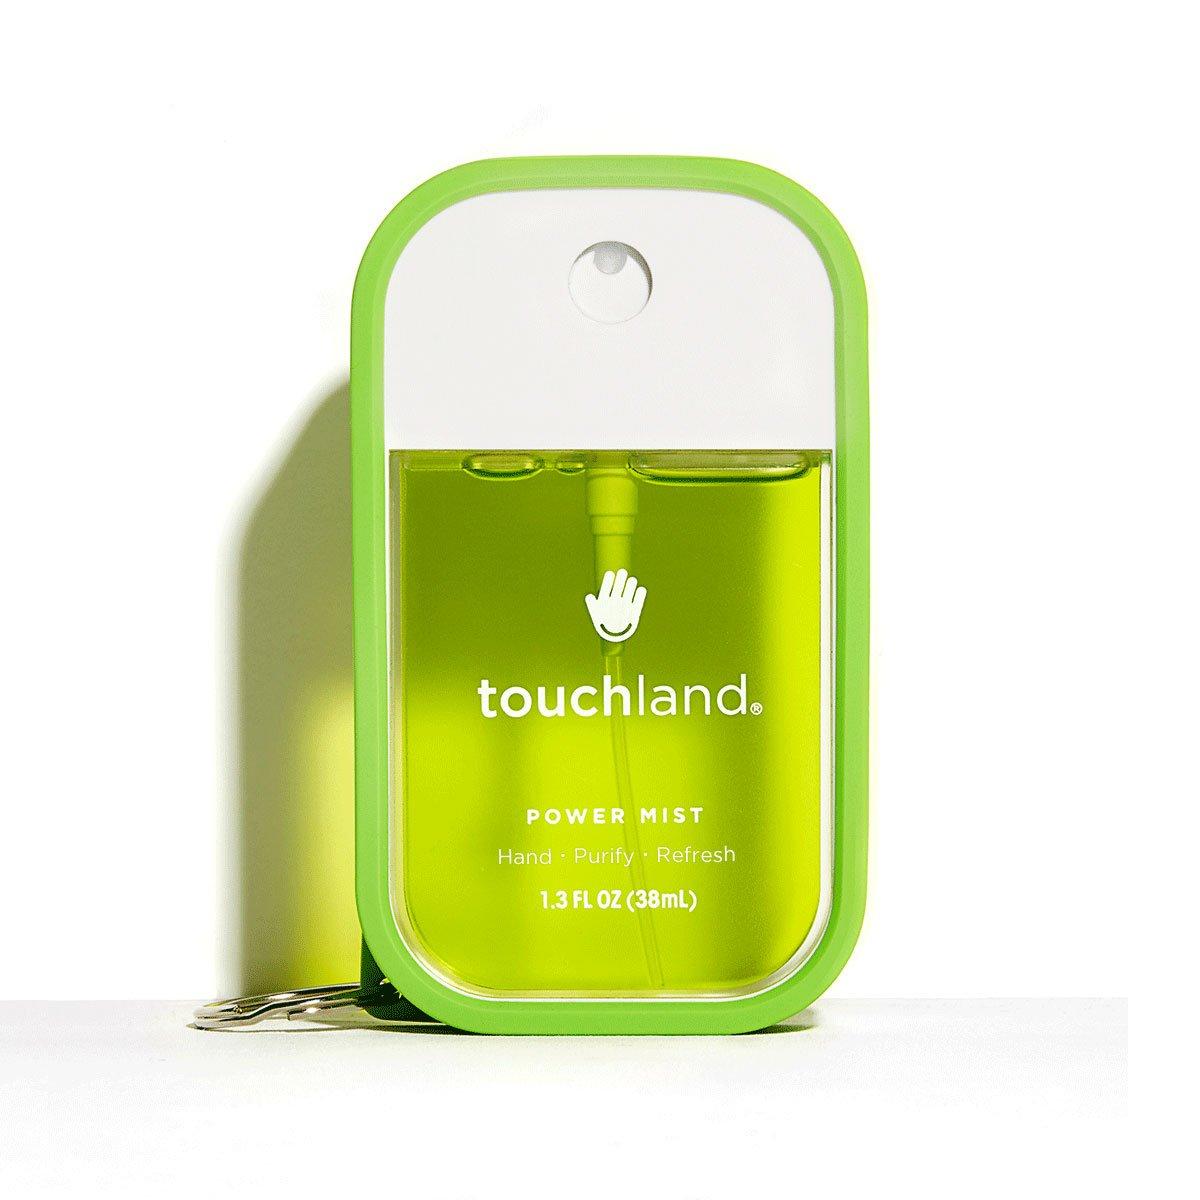 touchland_case-g